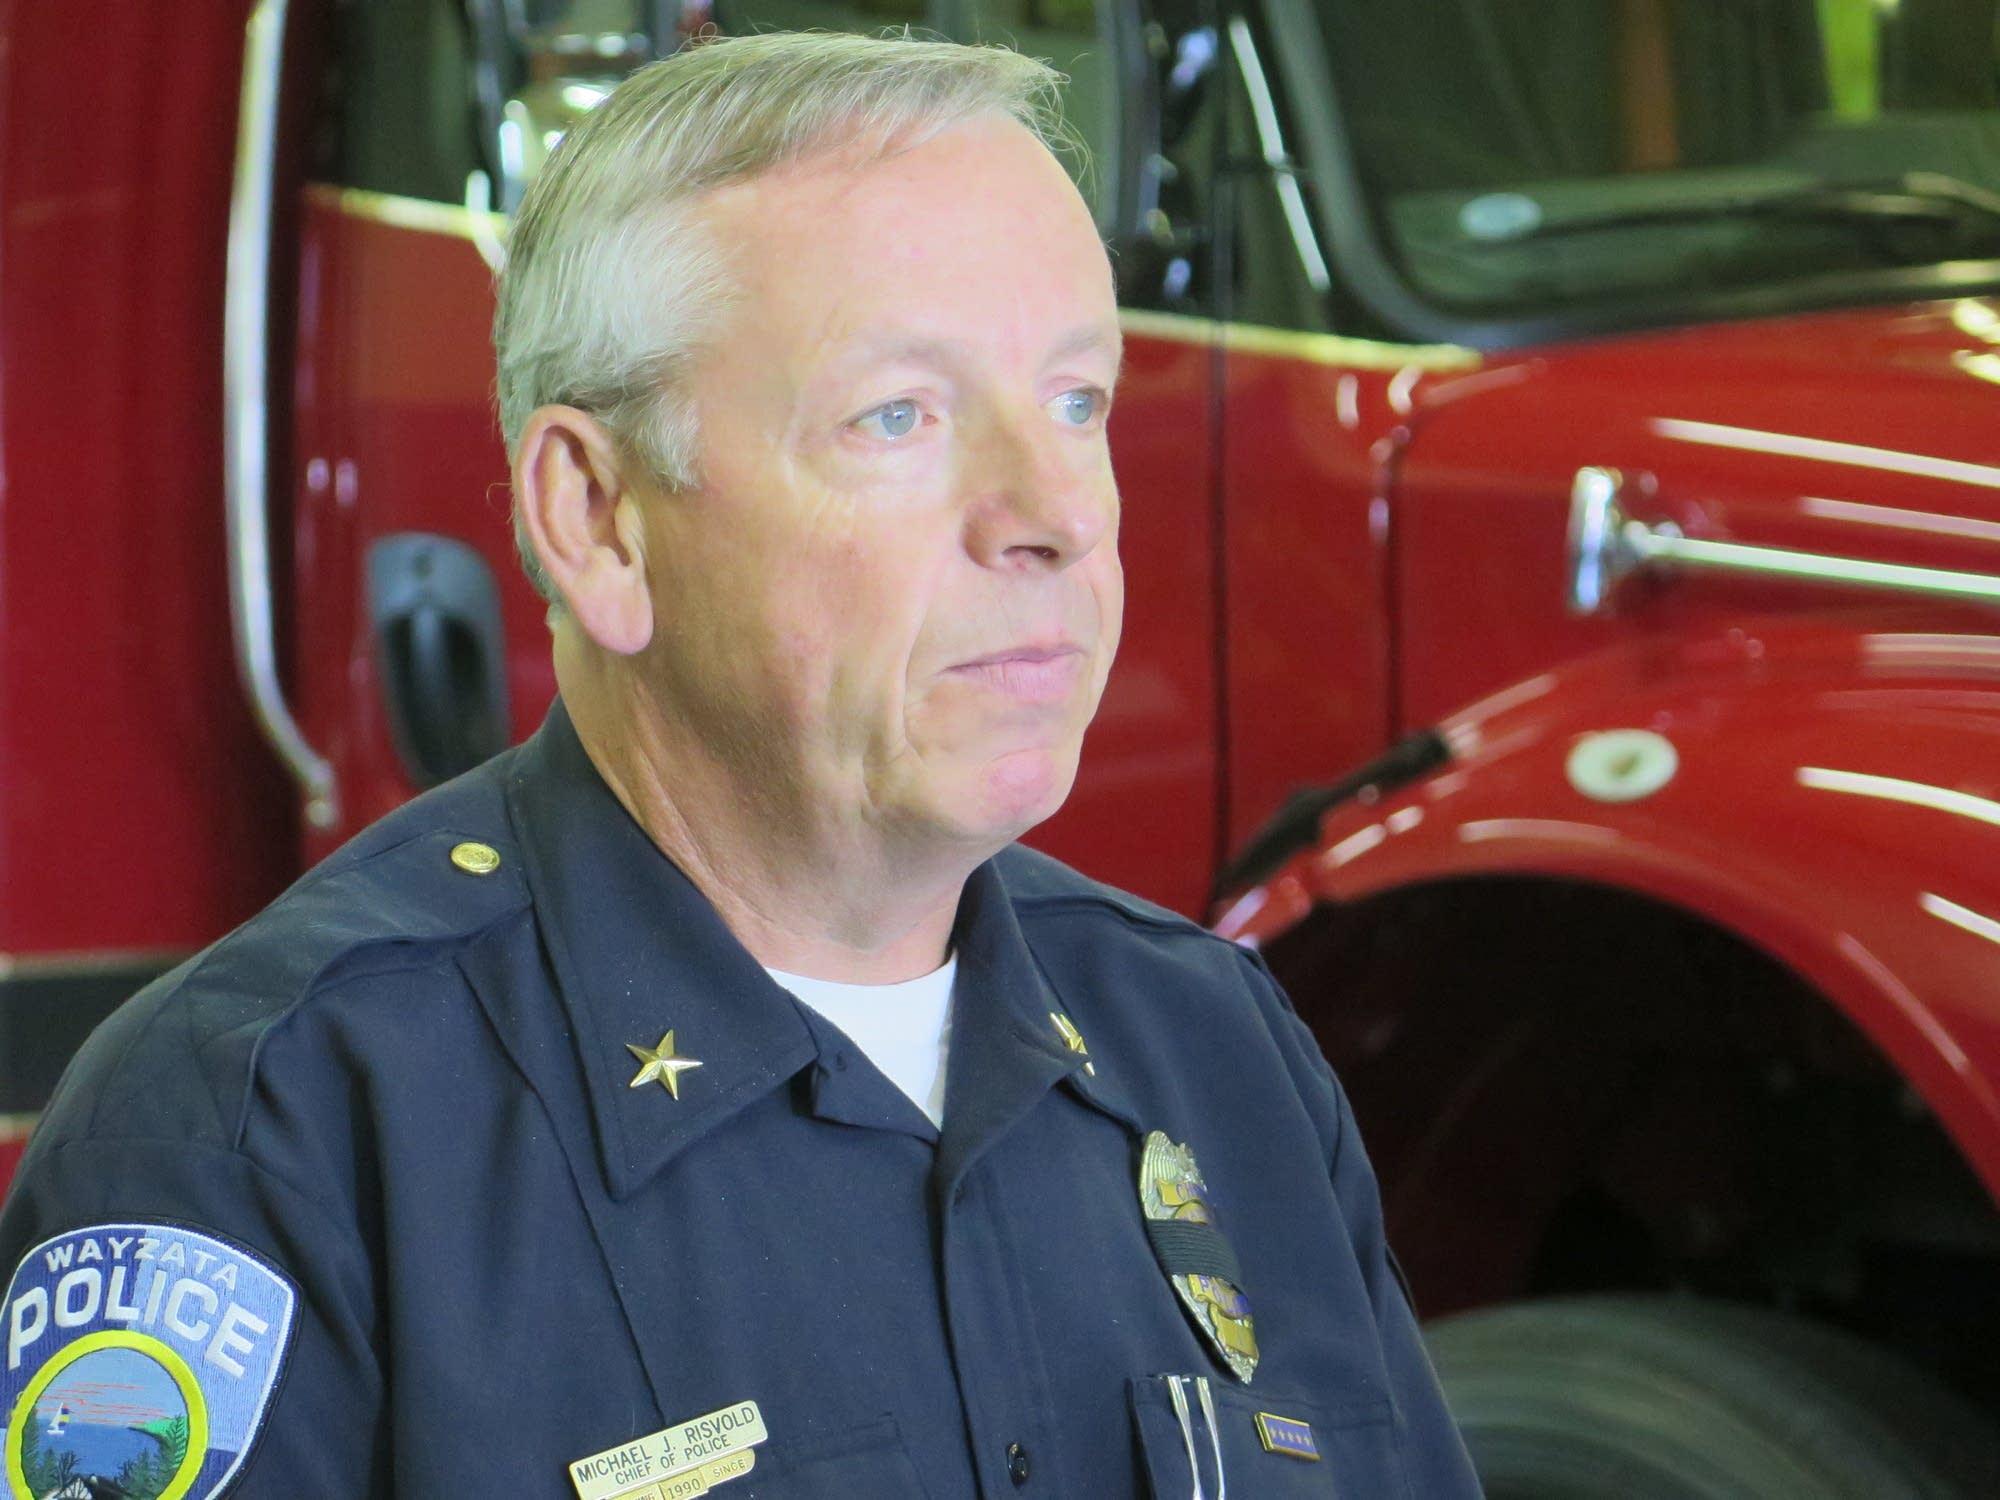 Wayzata Police Chief Michael Risvold